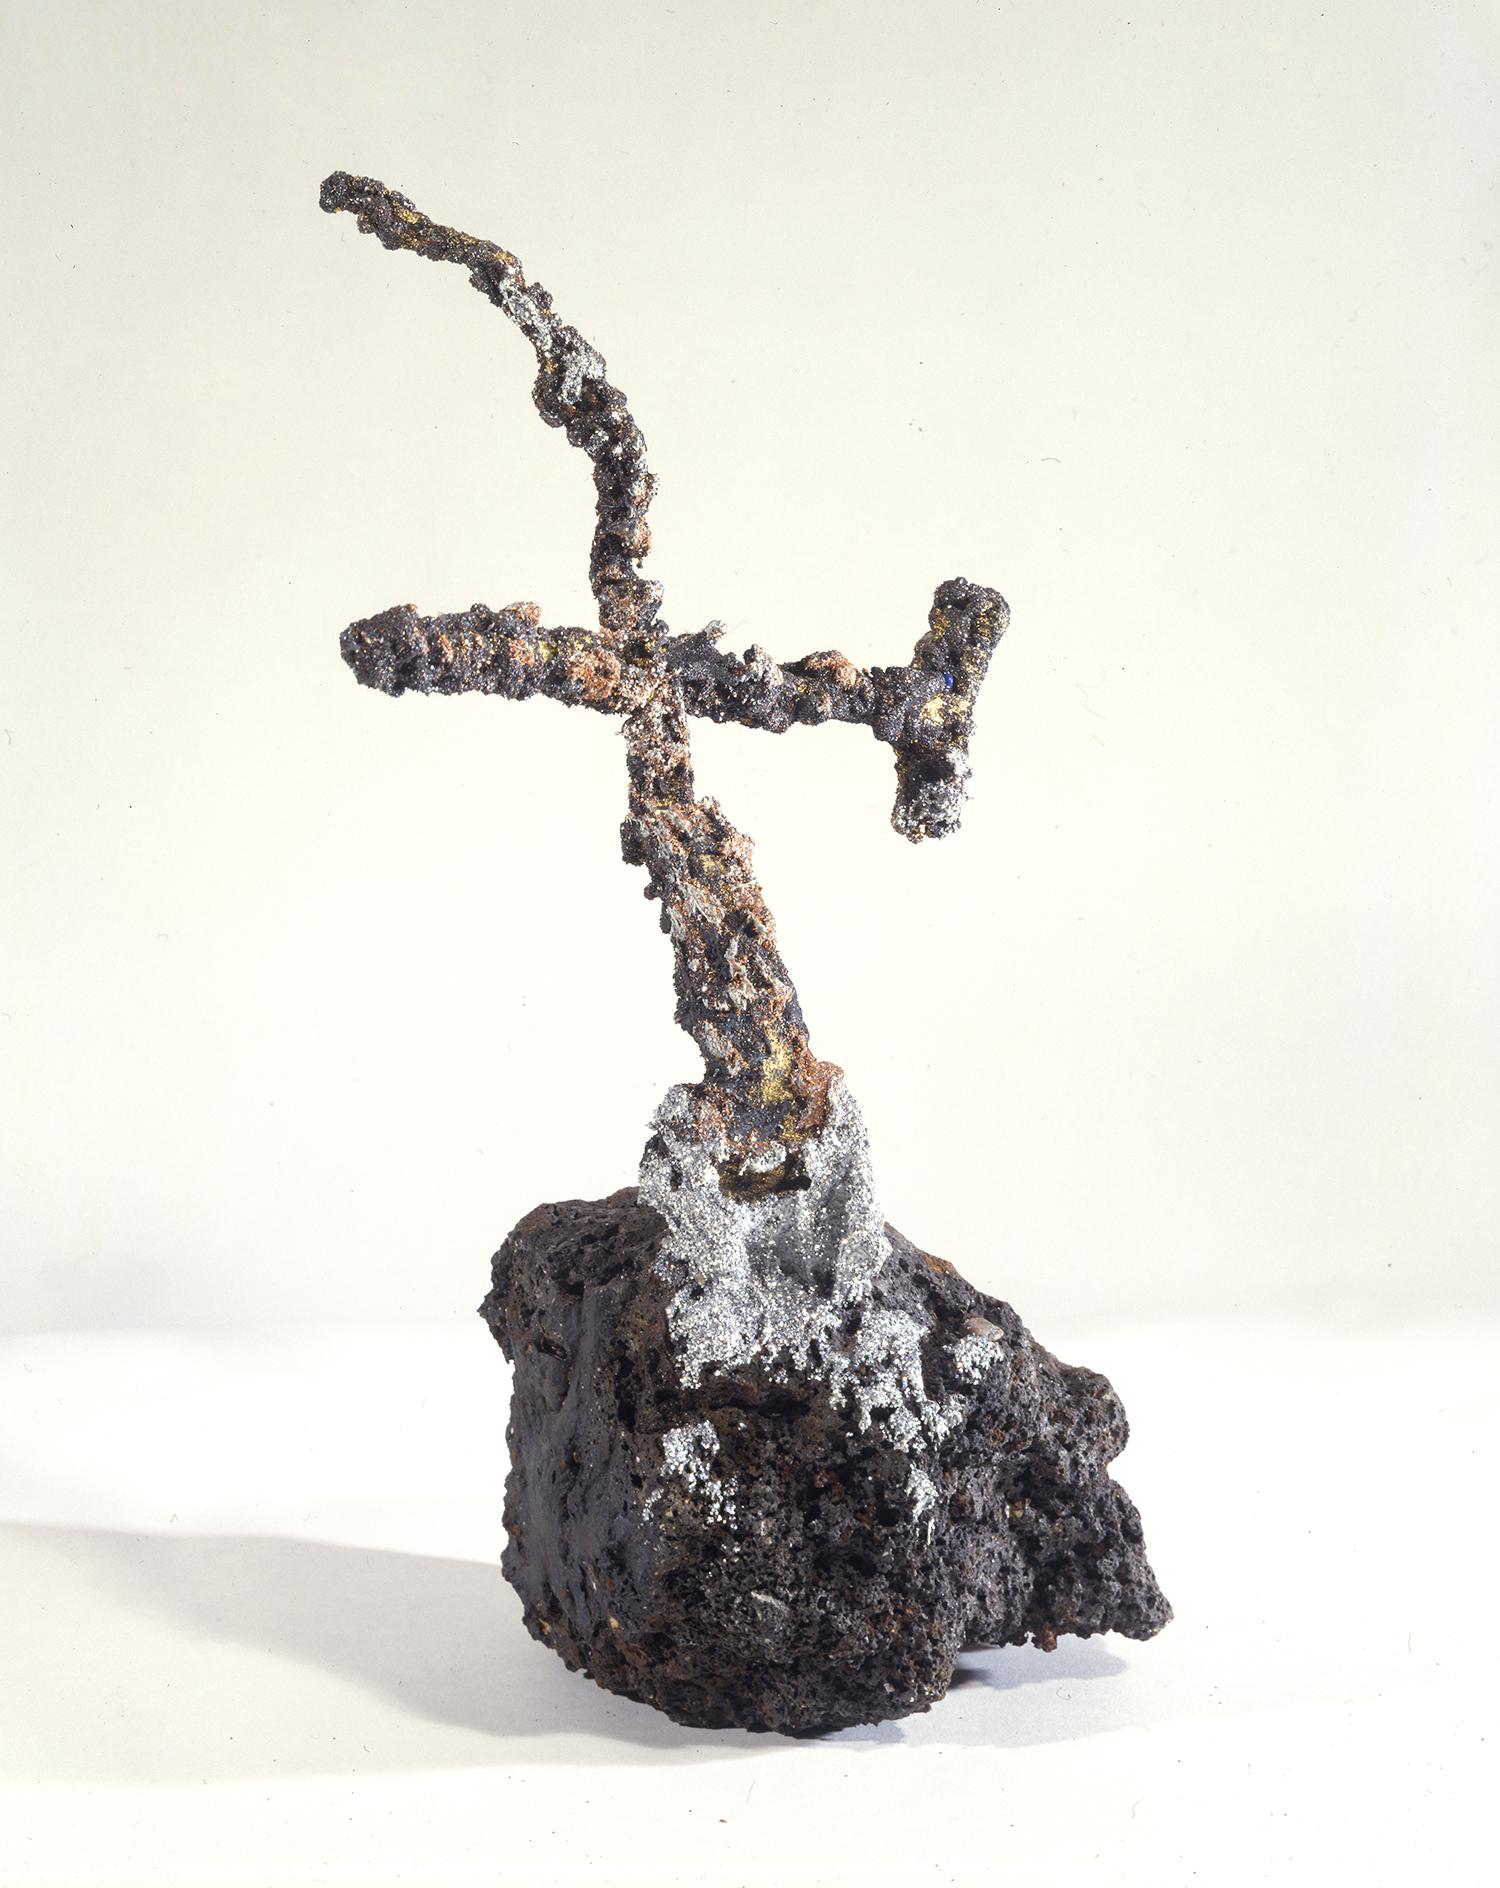 Moon Rock with Cross